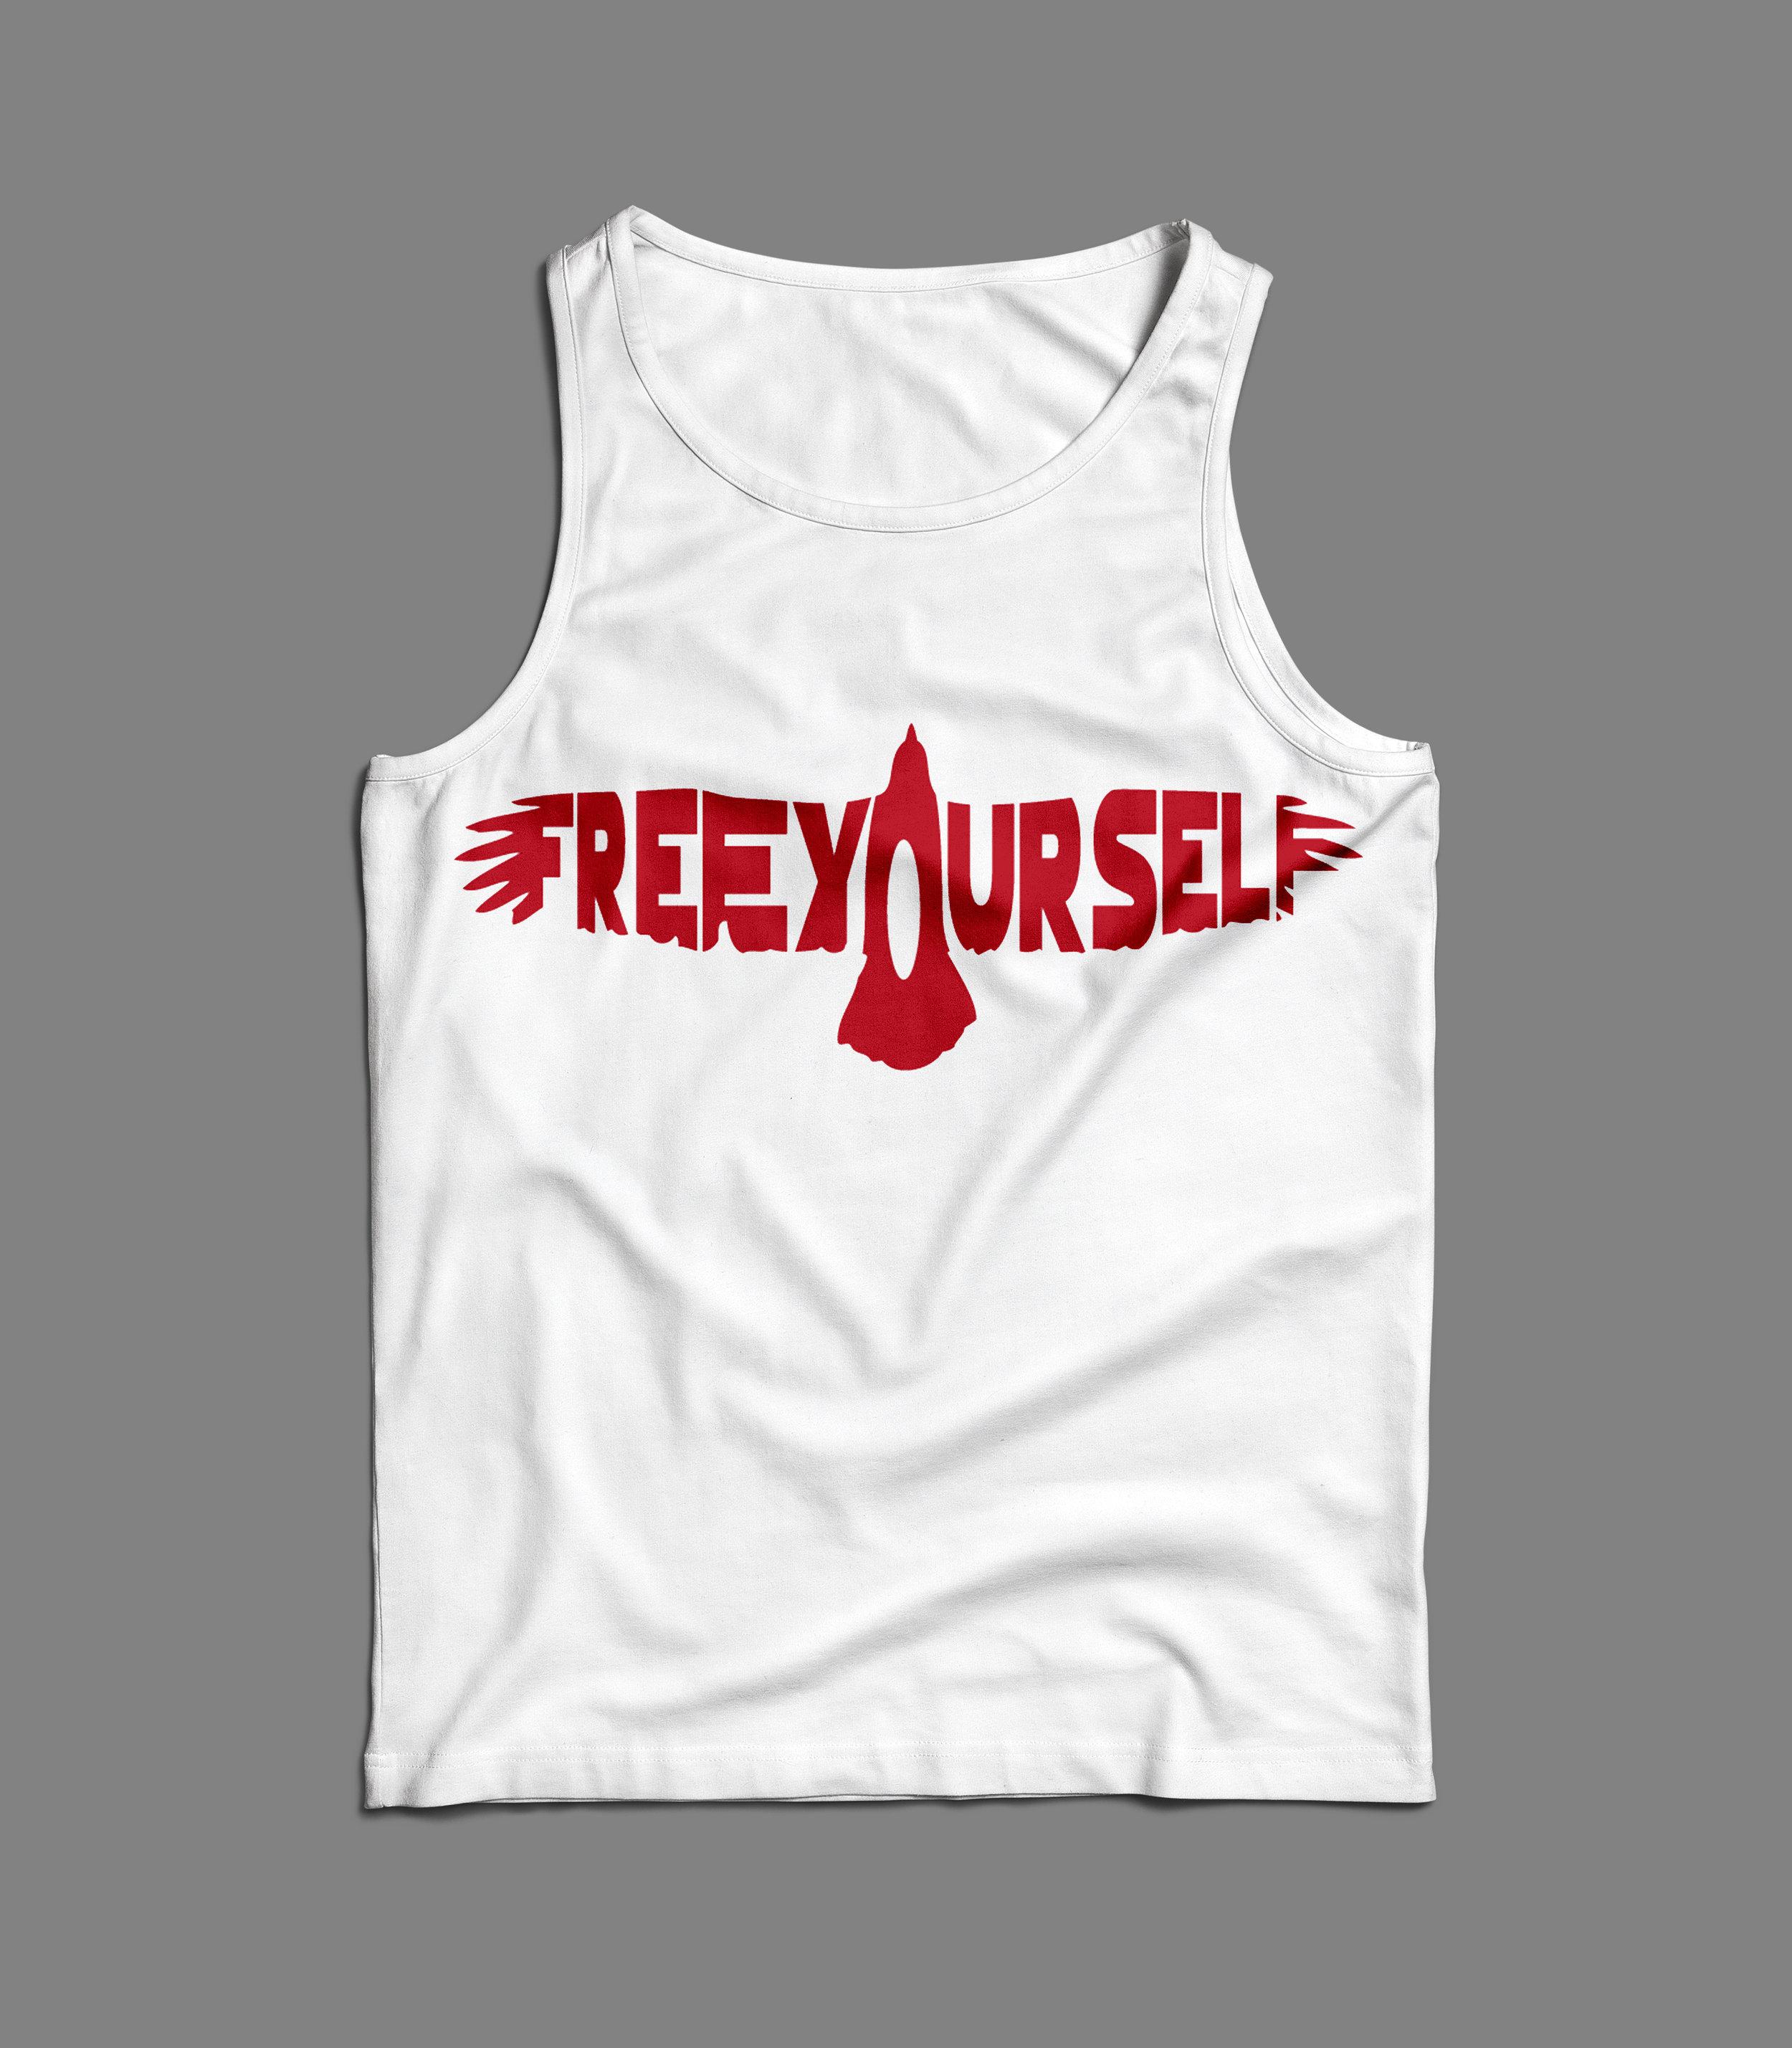 Free Yourself Training Shirt